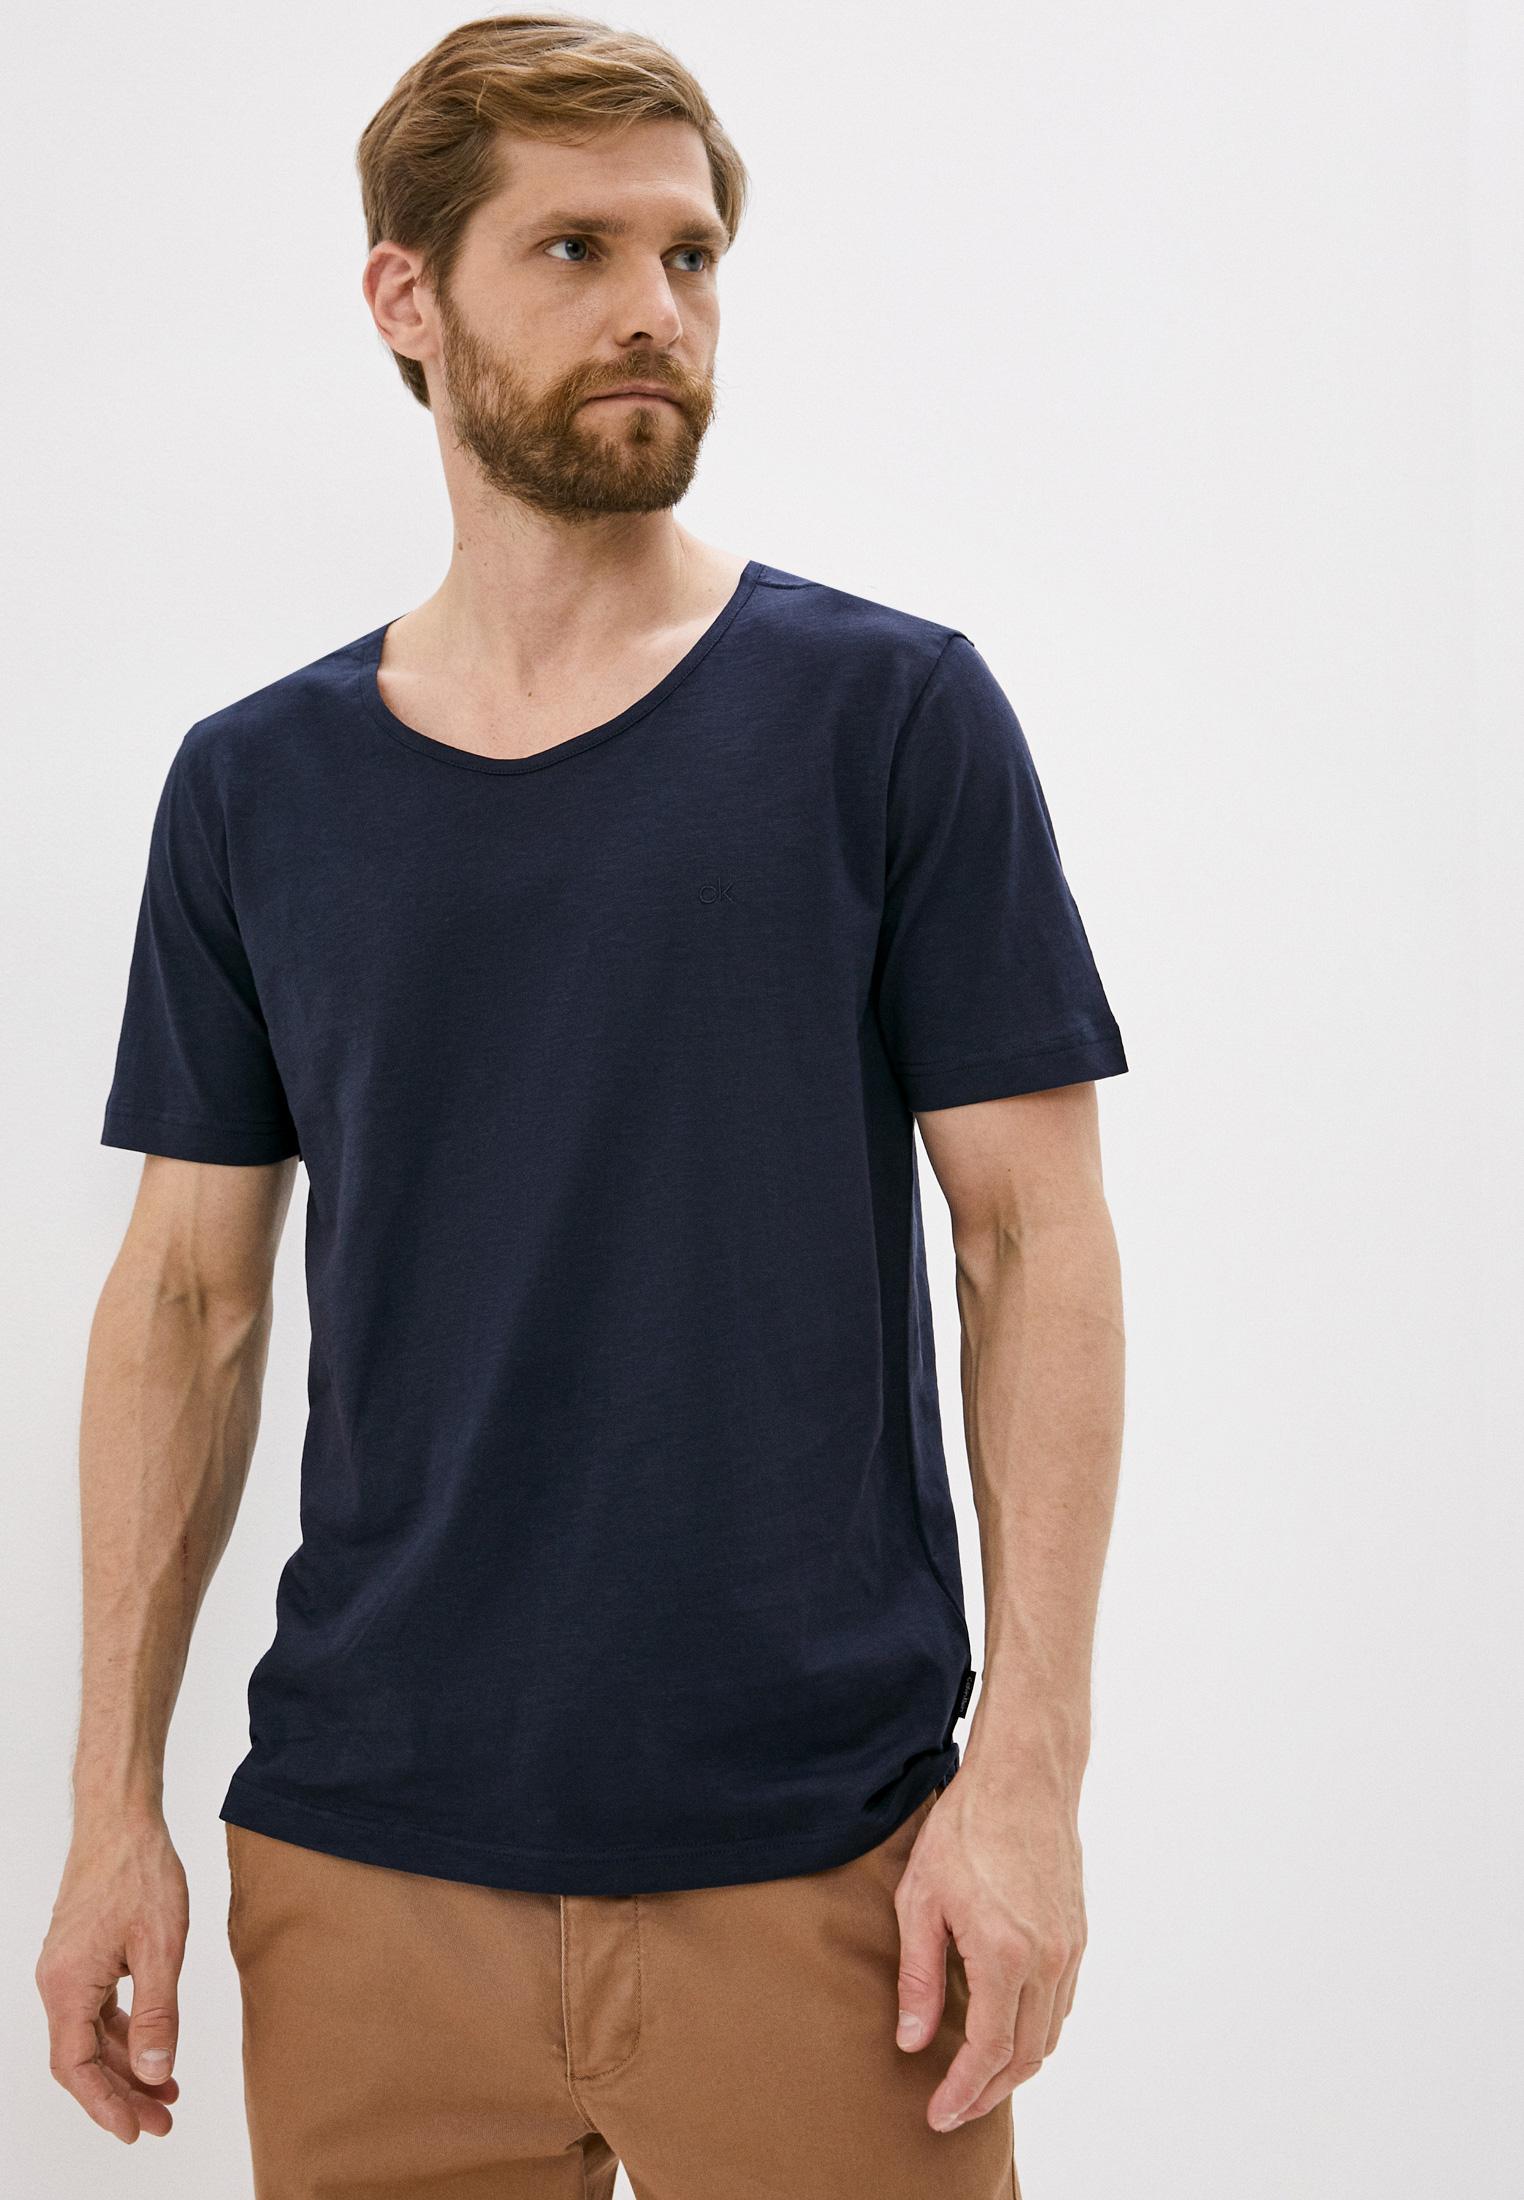 Мужская футболка Calvin Klein (Кельвин Кляйн) K10K105576